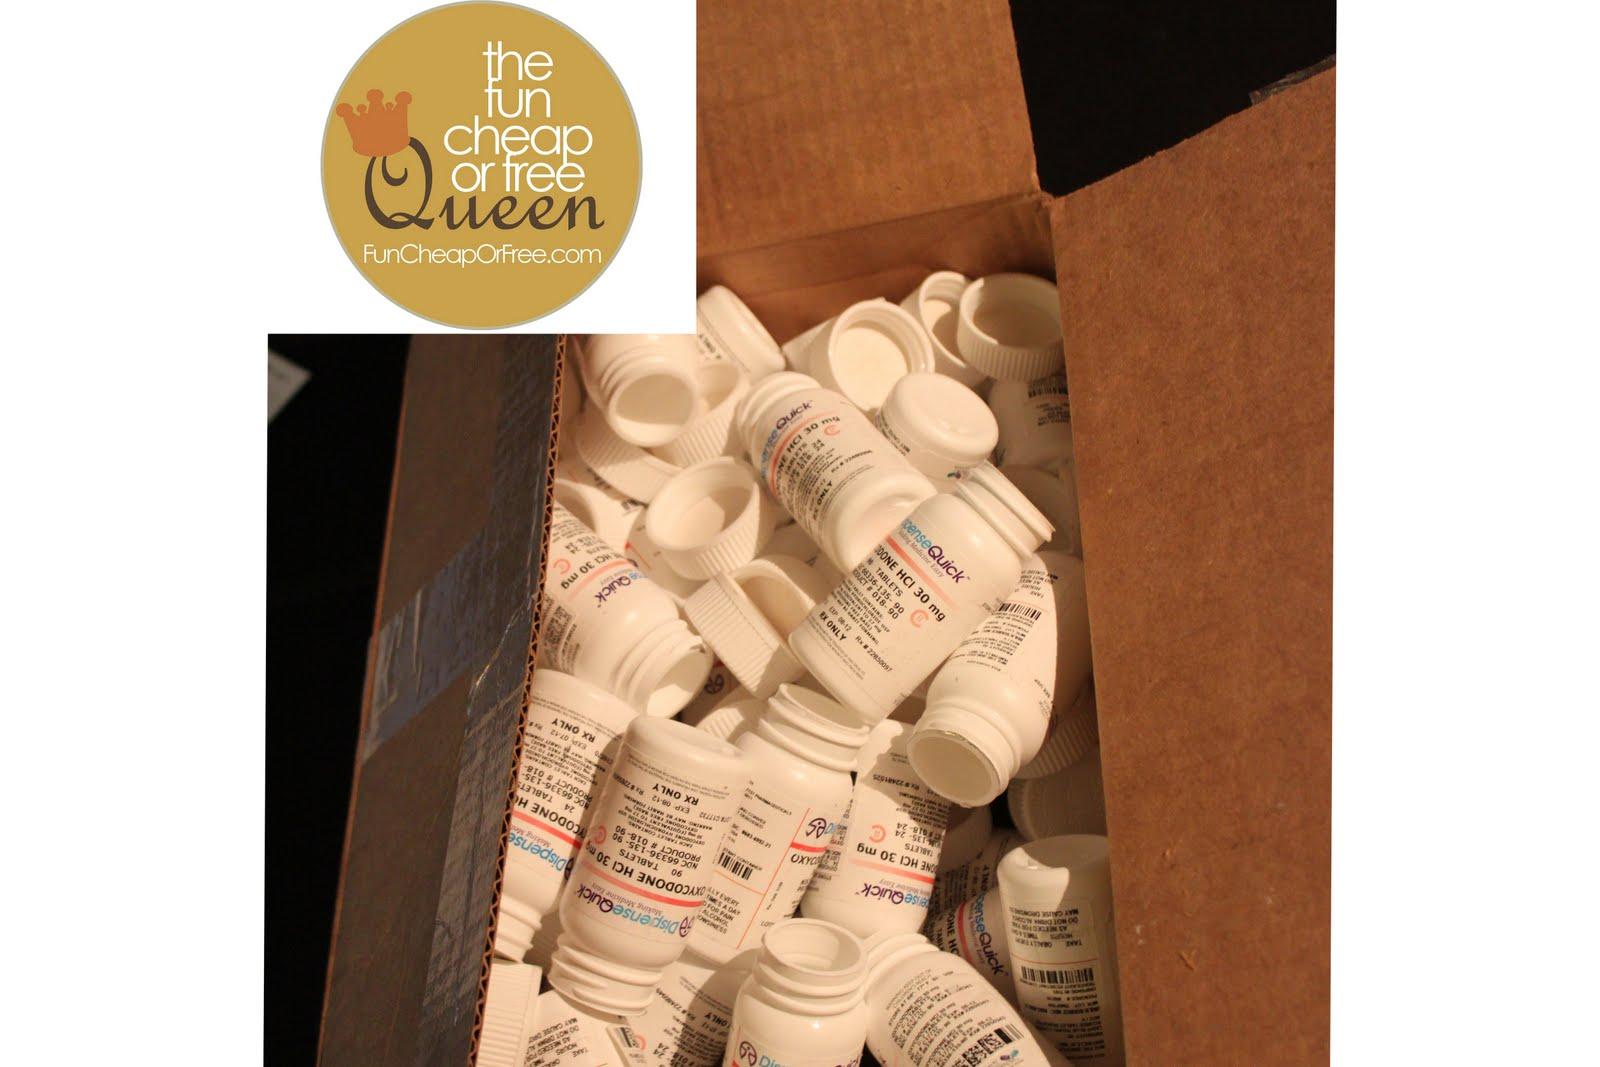 DIY Project: Pill bottle party favors